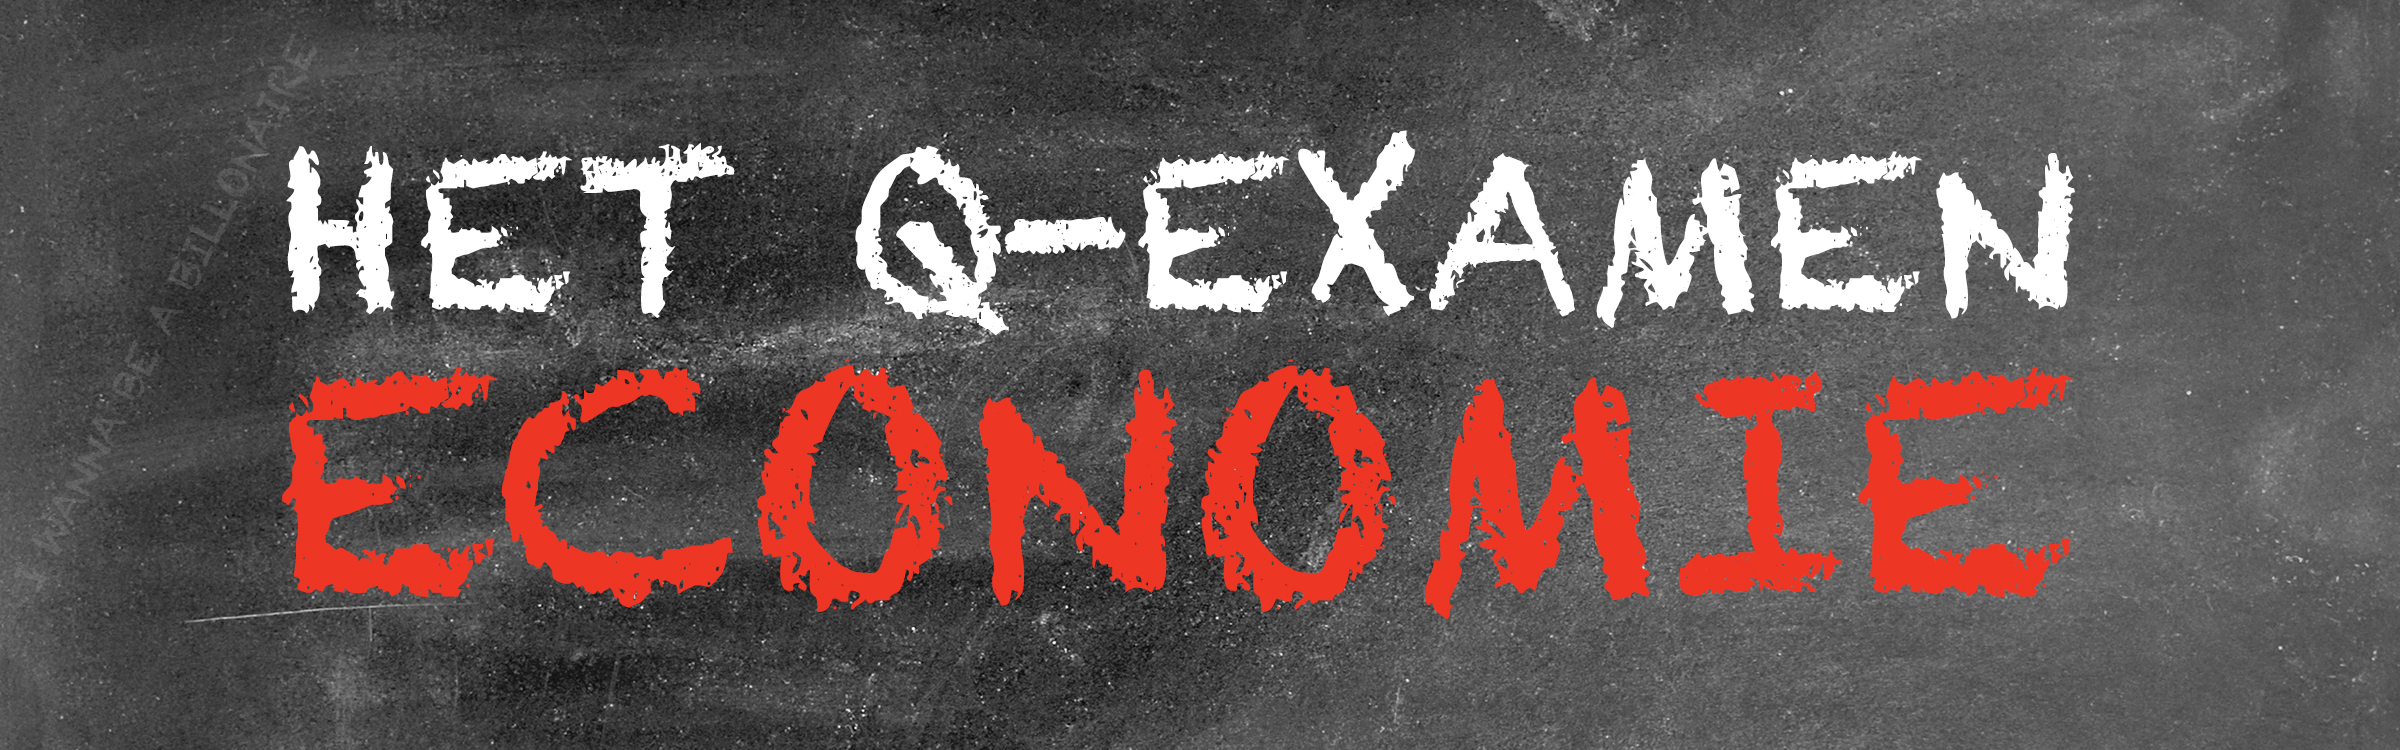 Qexamen economie header